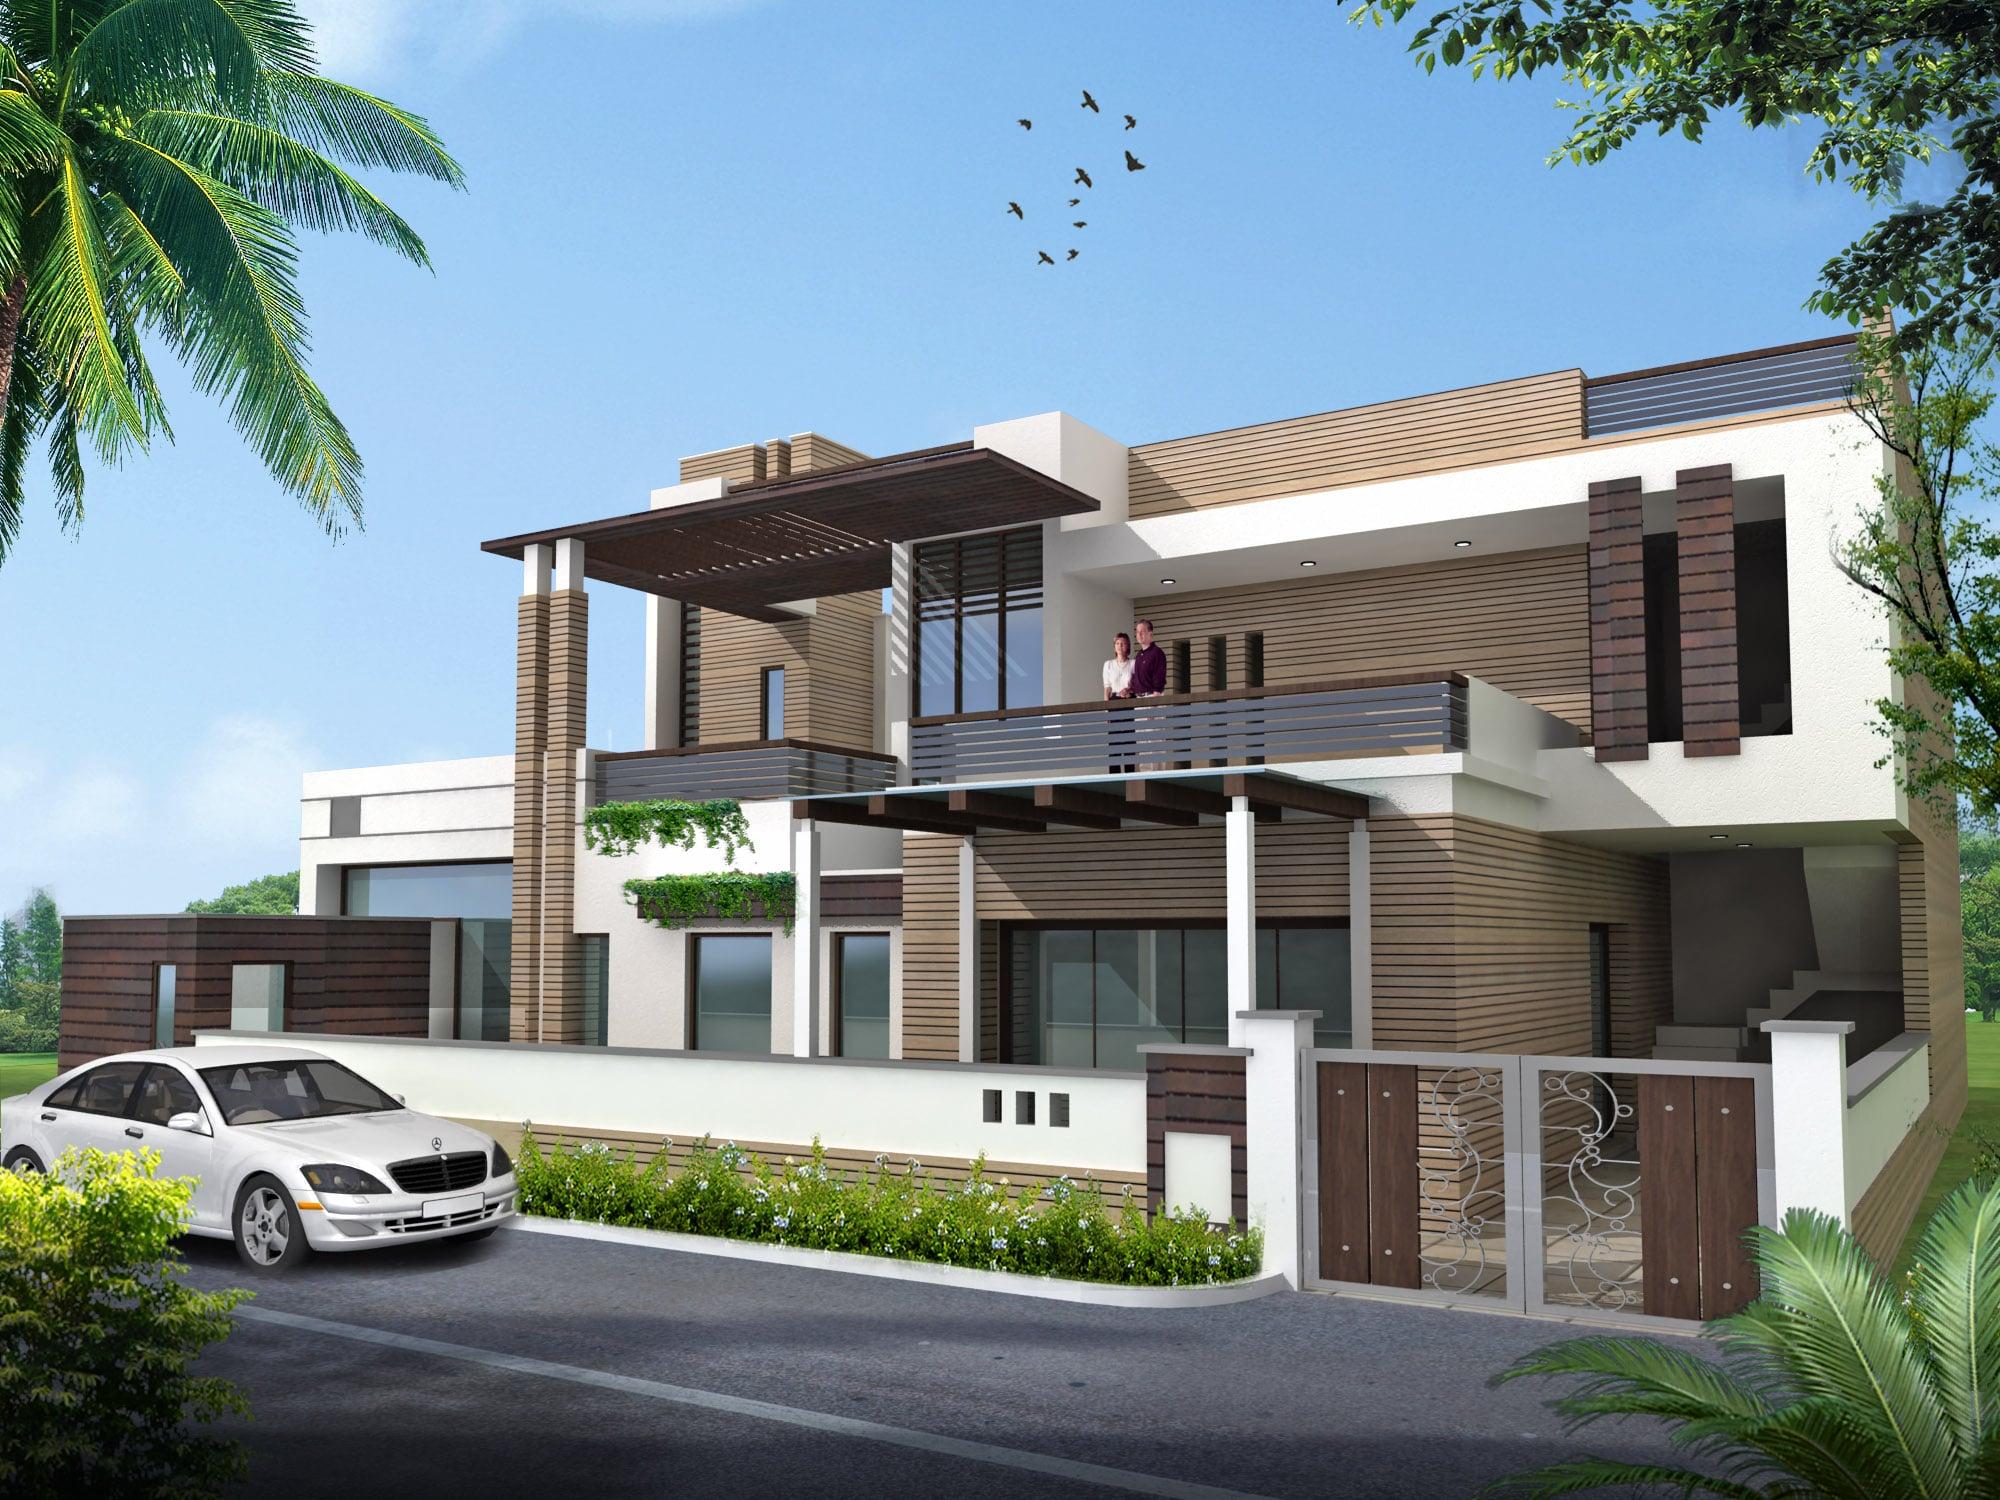 Fabulous Dream House Image